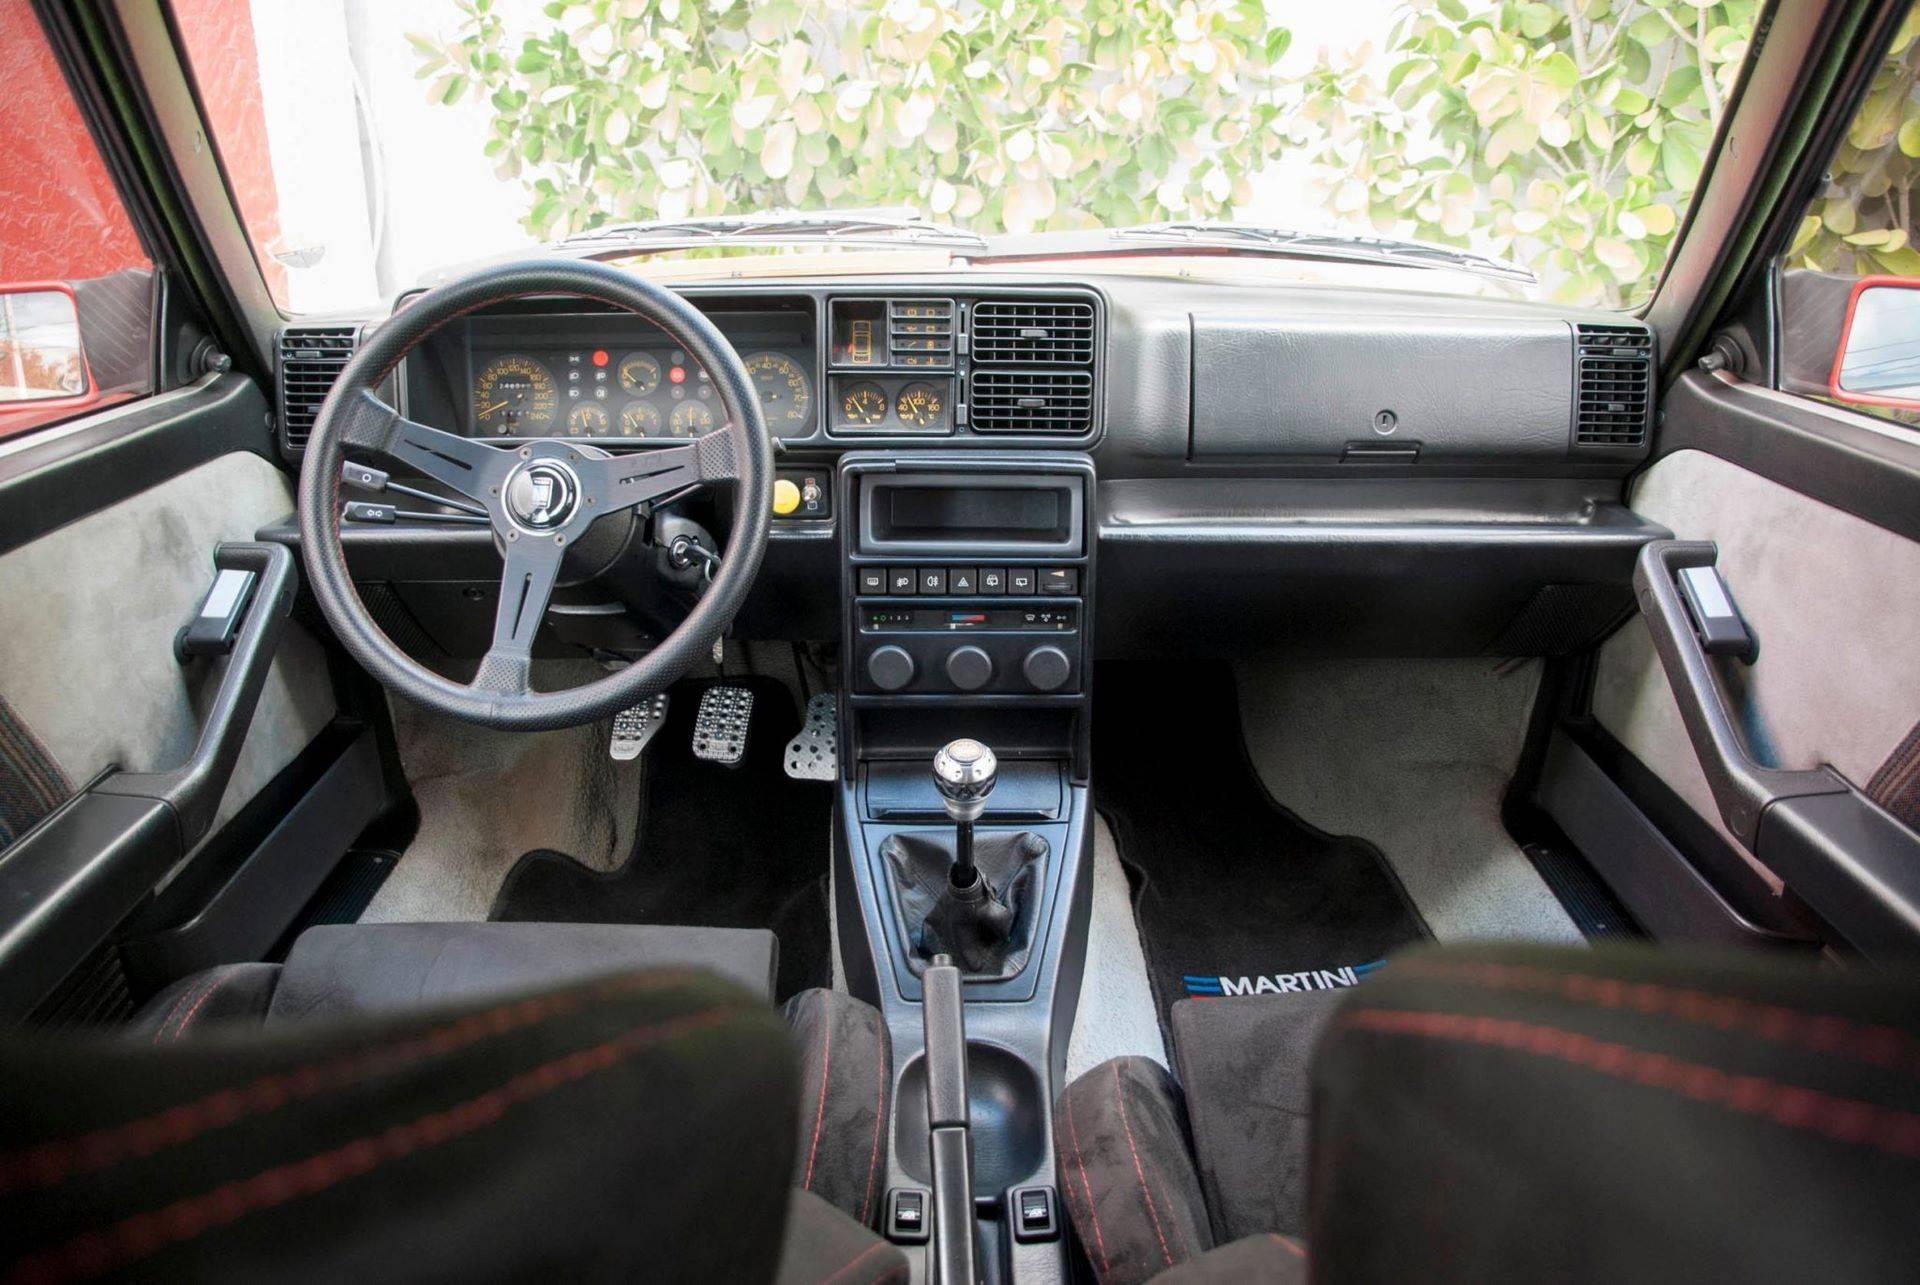 Lancia-Delta-Integrale-8V-1989-64